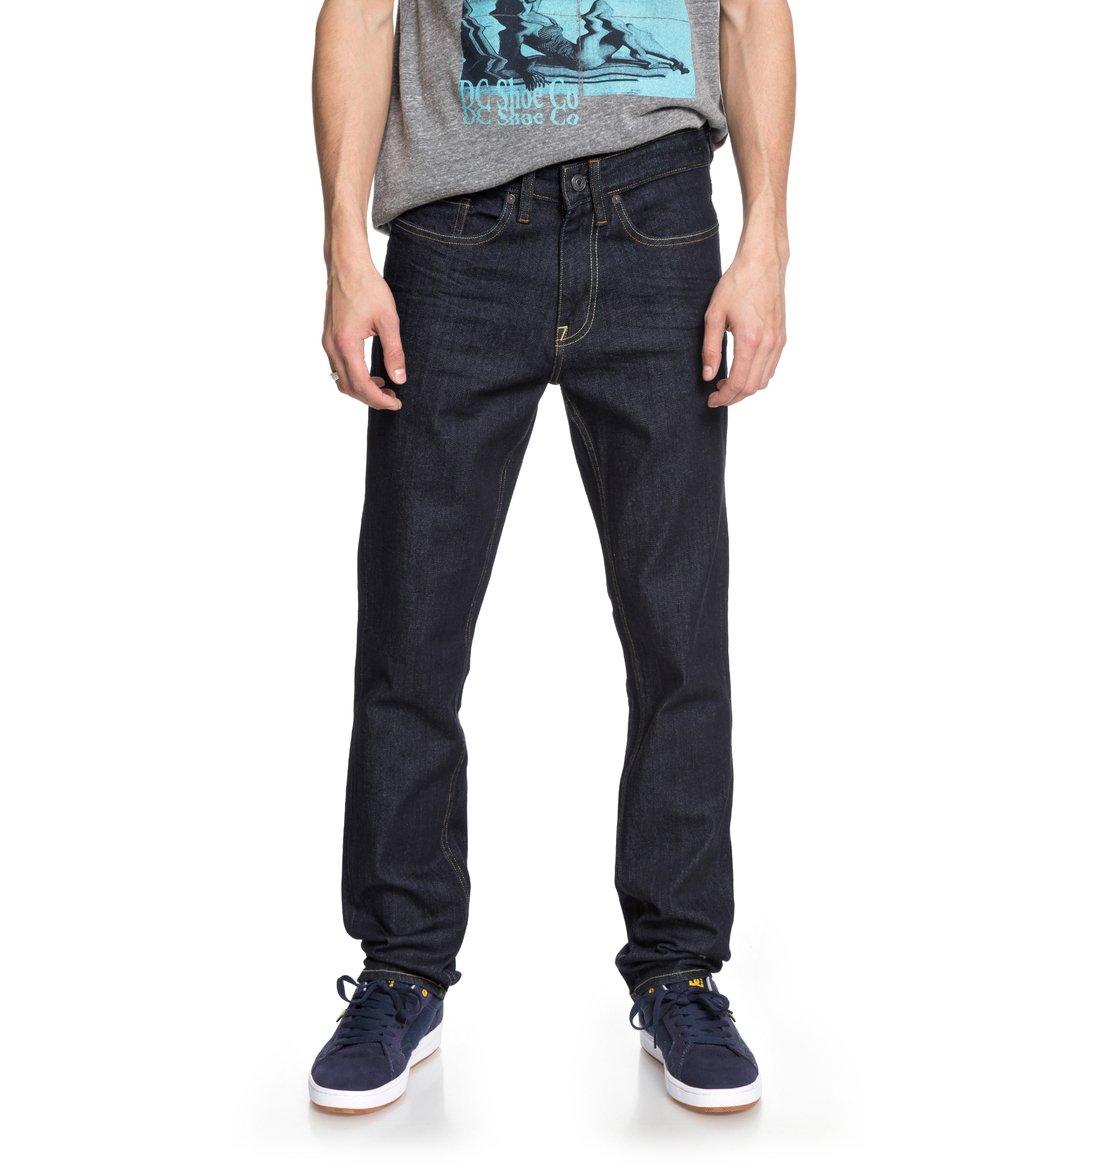 7ac6eb8a81c1f 0 Worker Indigo Rinse - Slim Fit Jeans for Men Blue EDYDP03369 DC Shoes